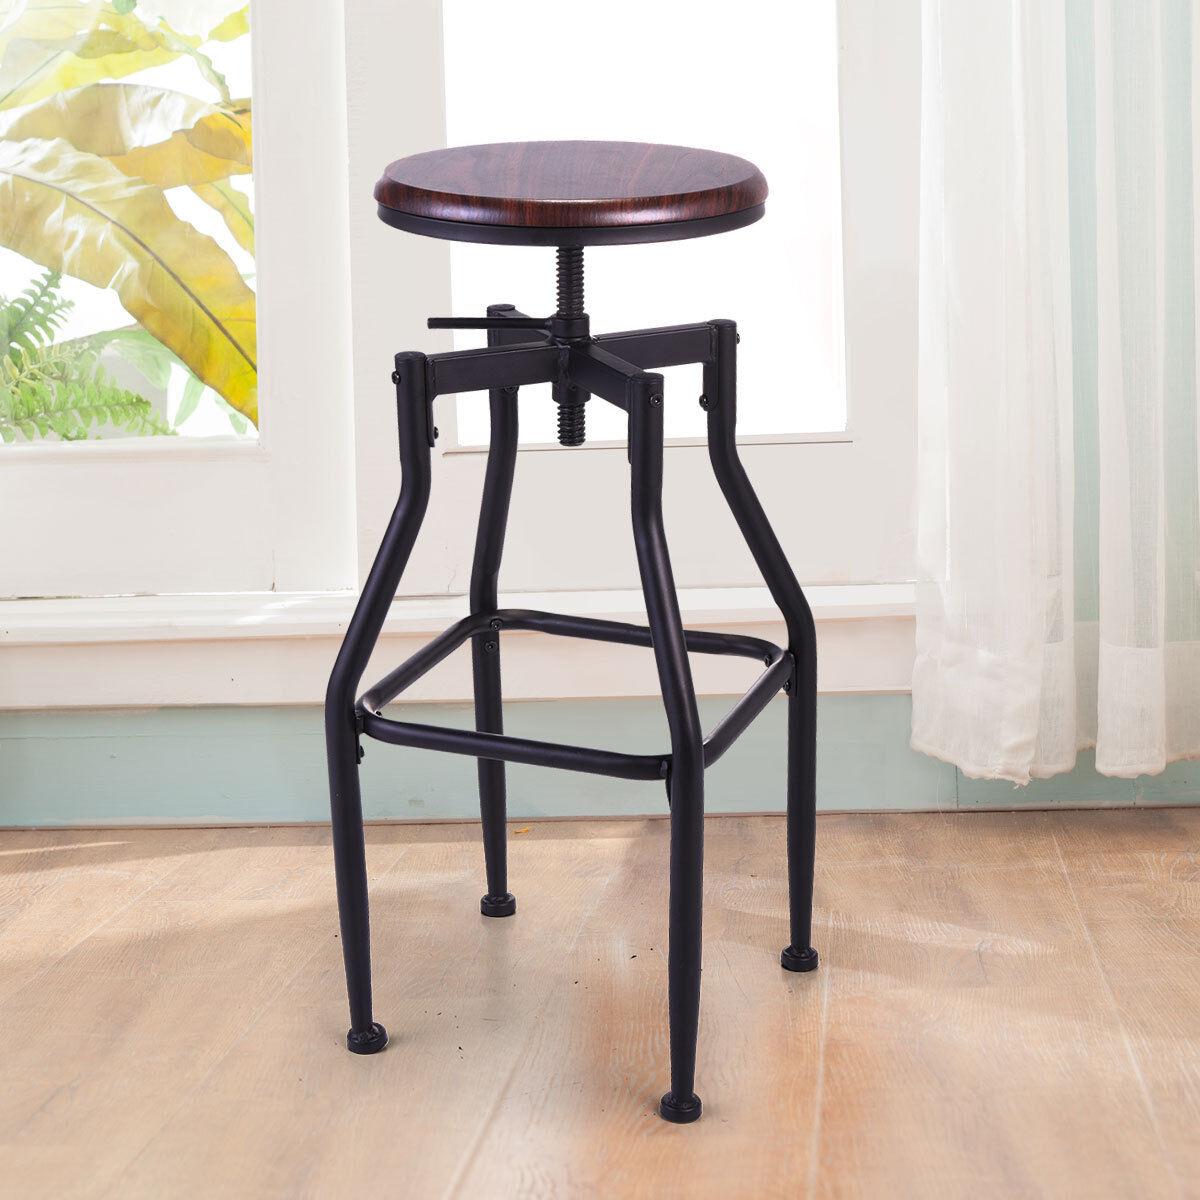 Enjoyable New Vintage Bar Stool Metal Design Wood Top Height Adjustable Swivel Industrial Ncnpc Chair Design For Home Ncnpcorg